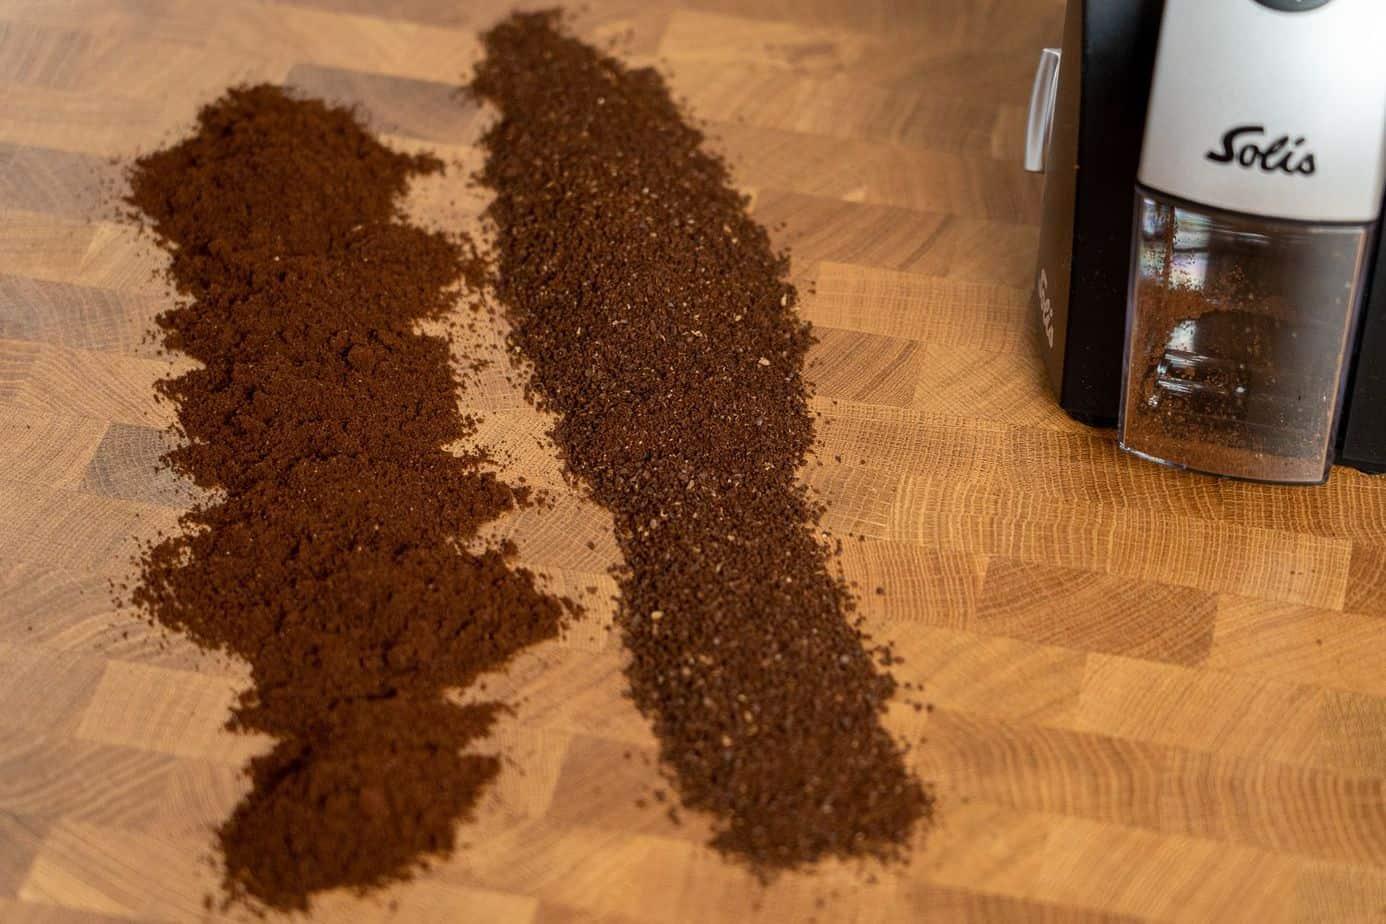 Solis 960 77 Kaffeemuehle Kaffeemehl Vergleich